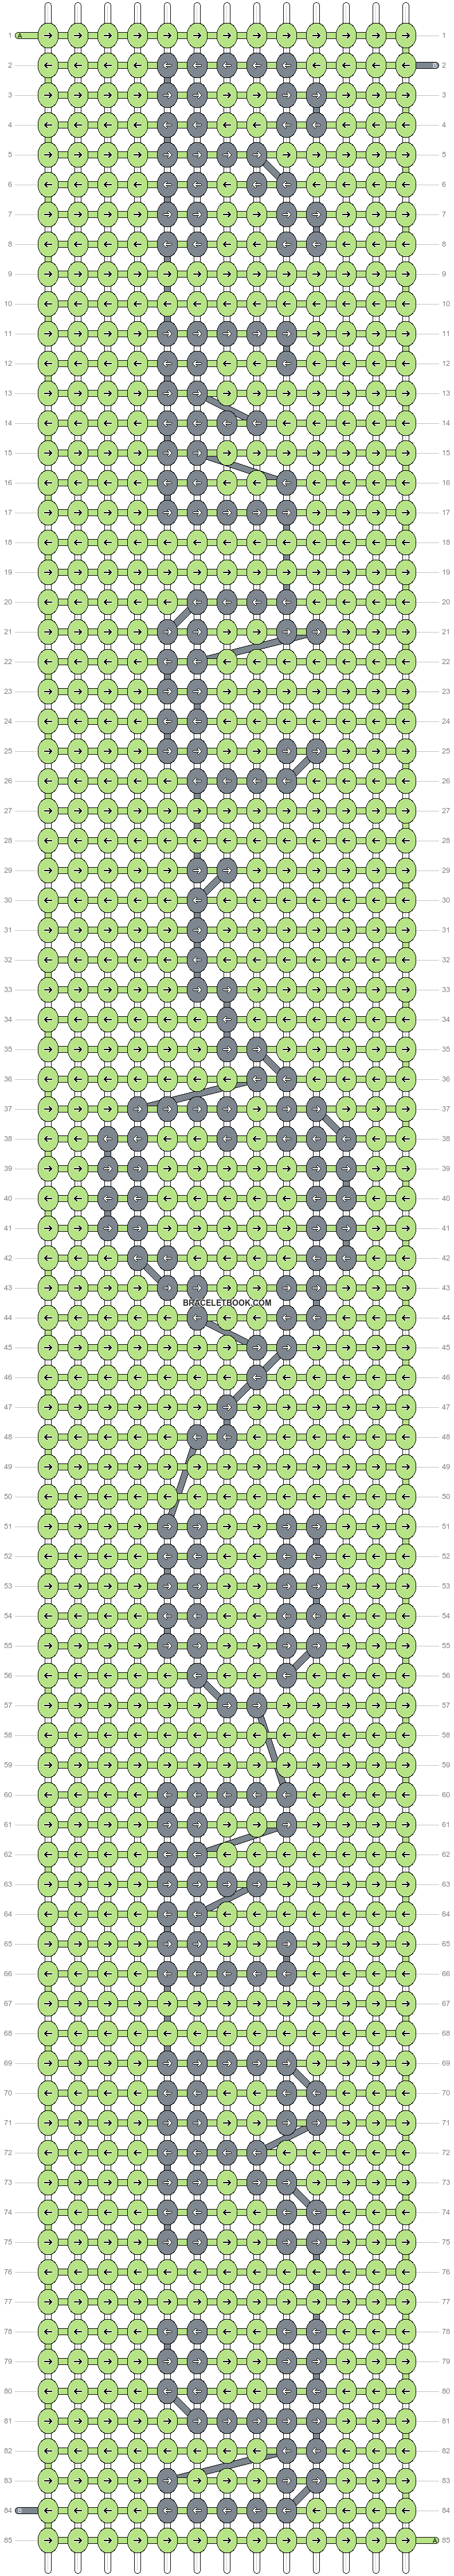 Alpha pattern #23585 pattern